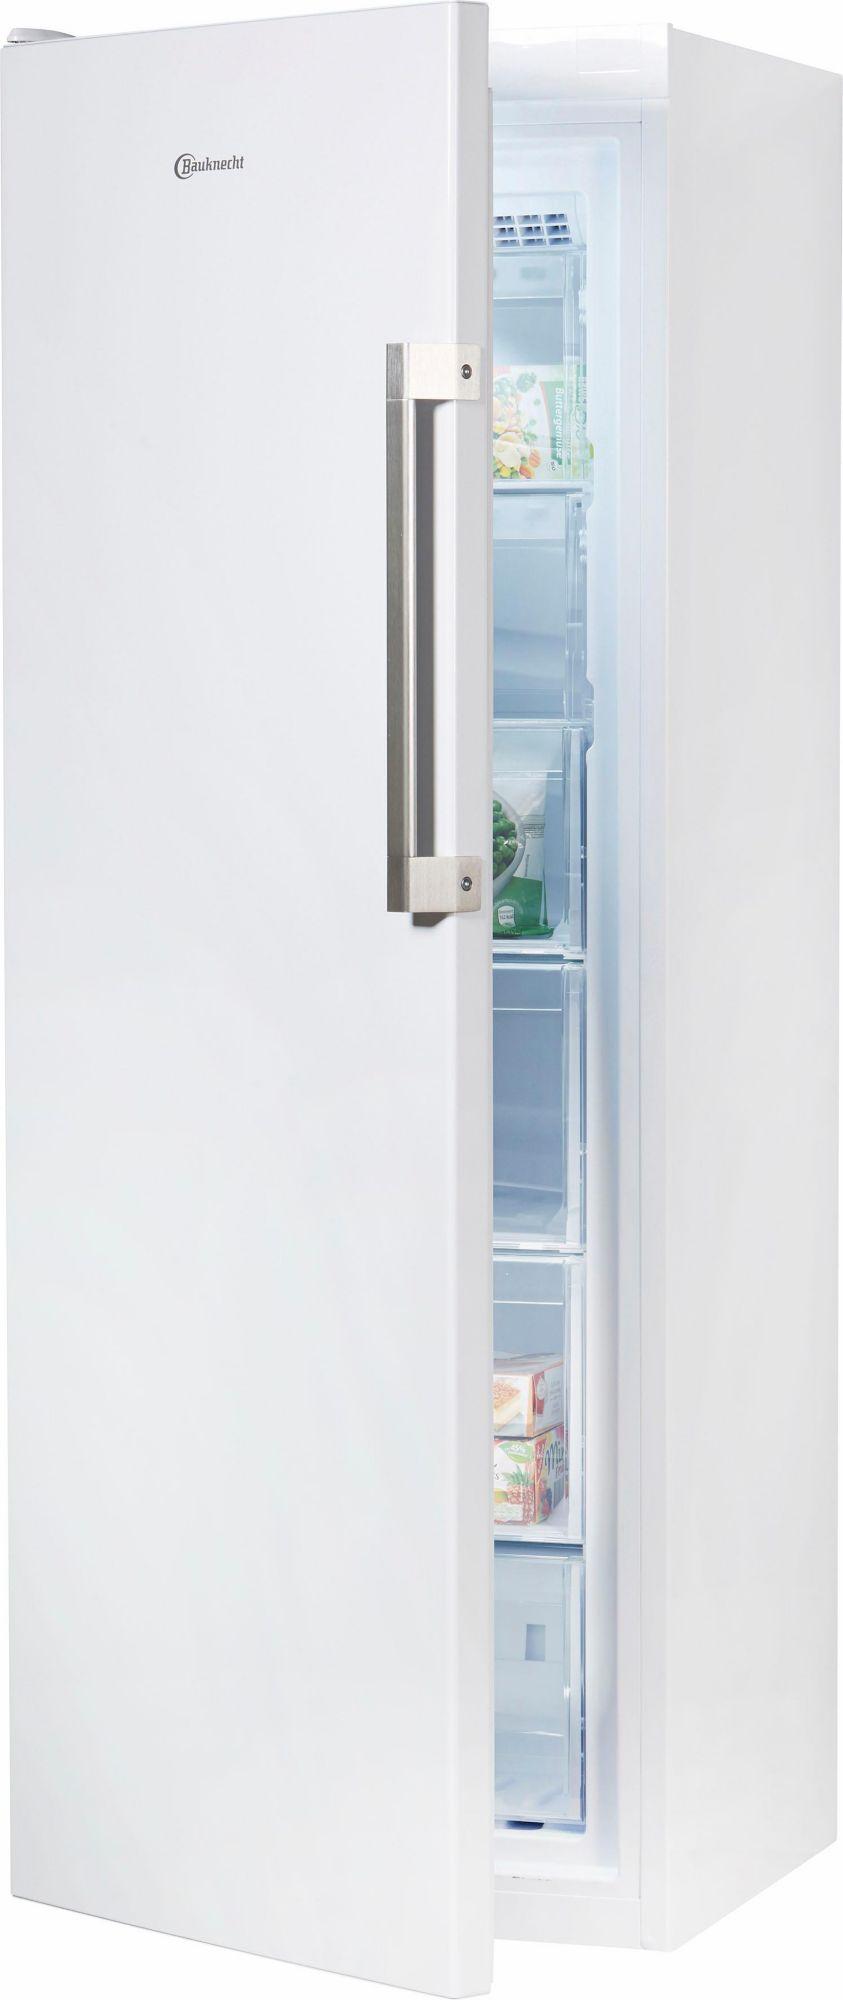 BAUKNECHT  Gefrierschrank GKN 17G3 A2+ WS, A++, 167 cm hoch, NoFrost